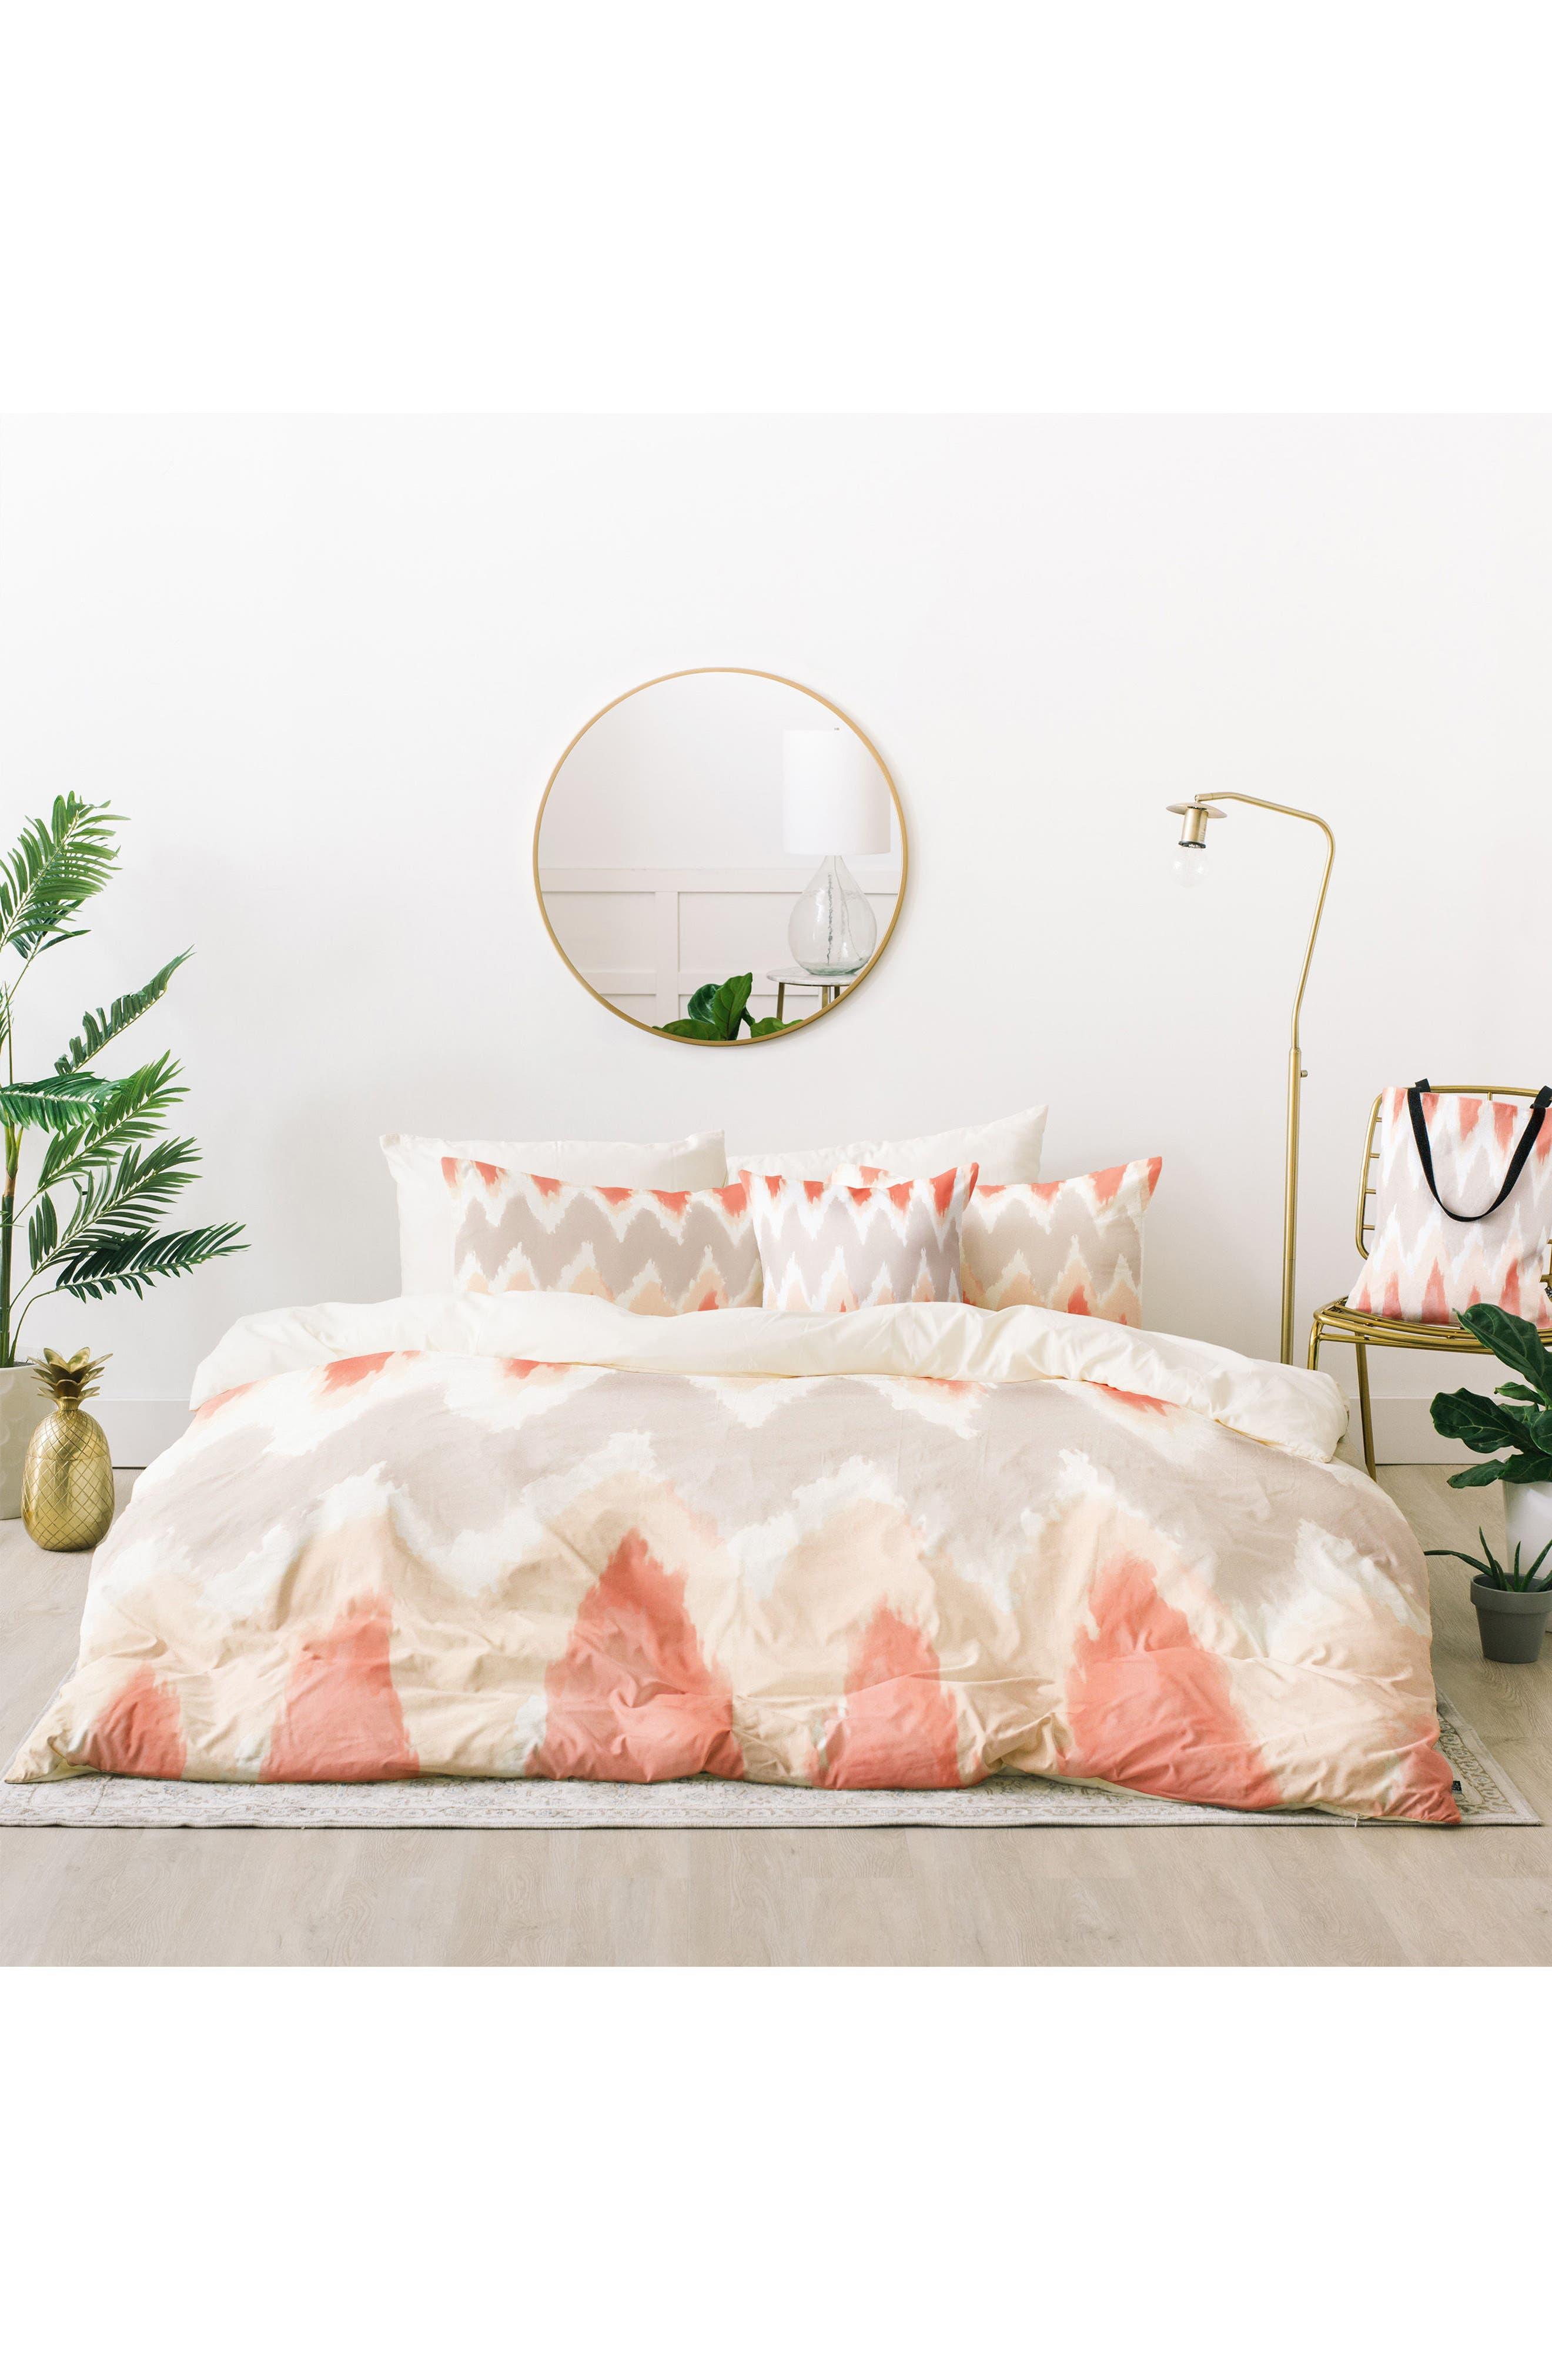 DENY DESIGNS Zoe Wodarz Zigzagzig Bed in a Bag Duvet Cover, Sham & Accent Pillow Set, Main, color, 250